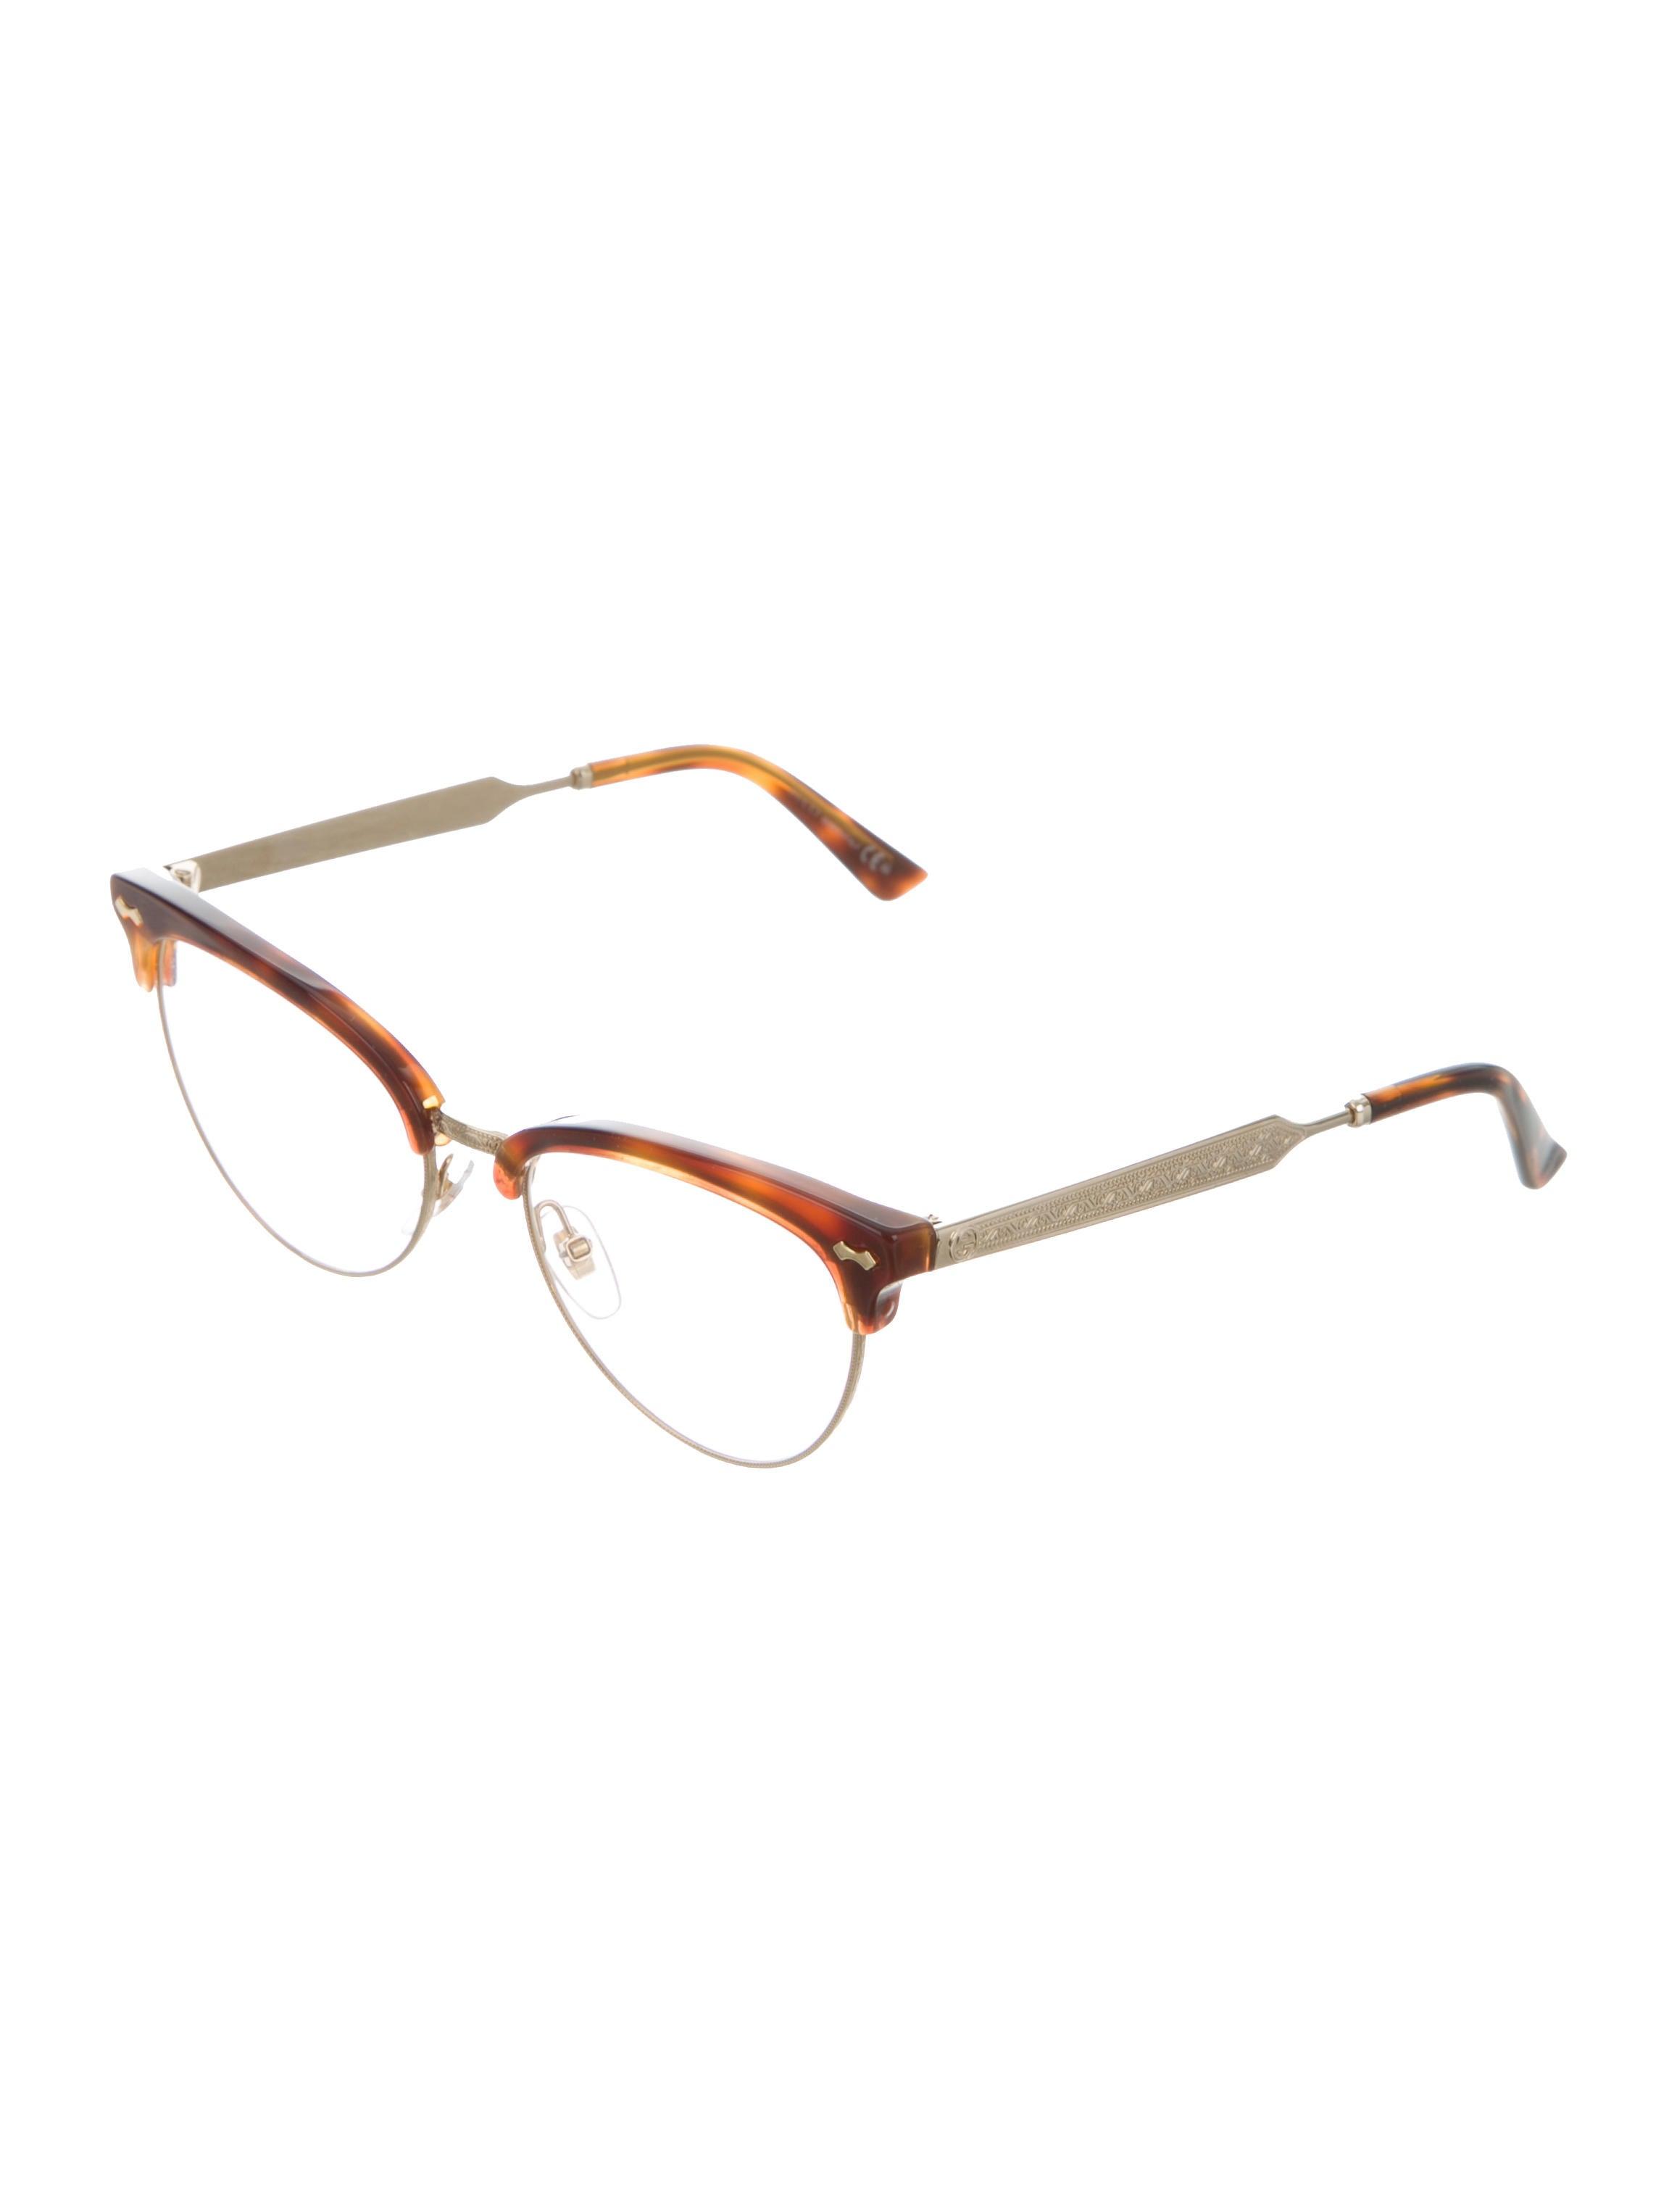 Gucci Tortoiseshell Cat-Eye Eyeglasses - Accessories ...